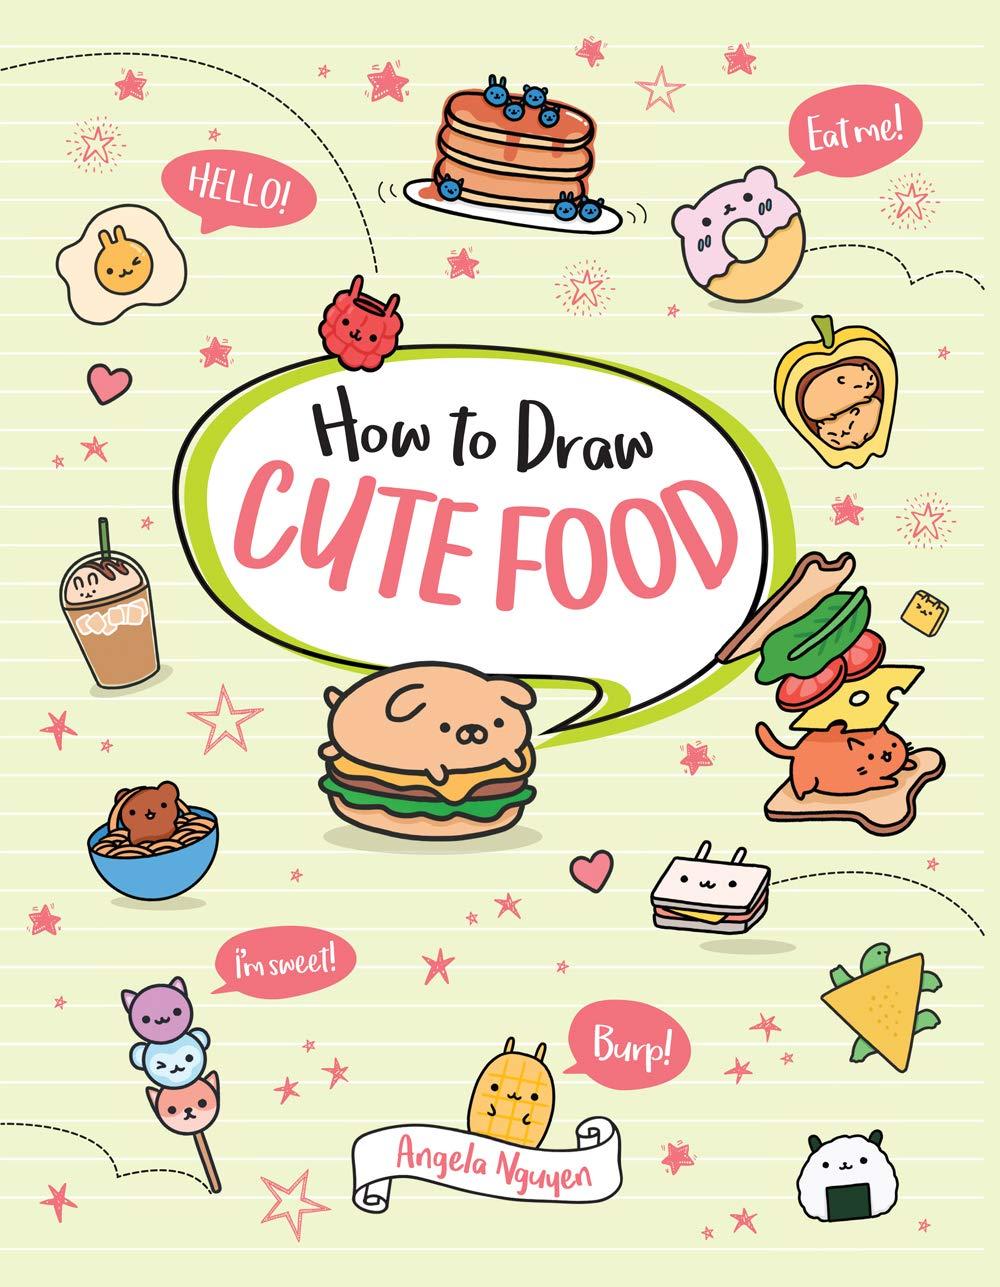 How To Draw Cute Food Volume 3 Nguyen Angela 9781454937562 Amazon Com Books